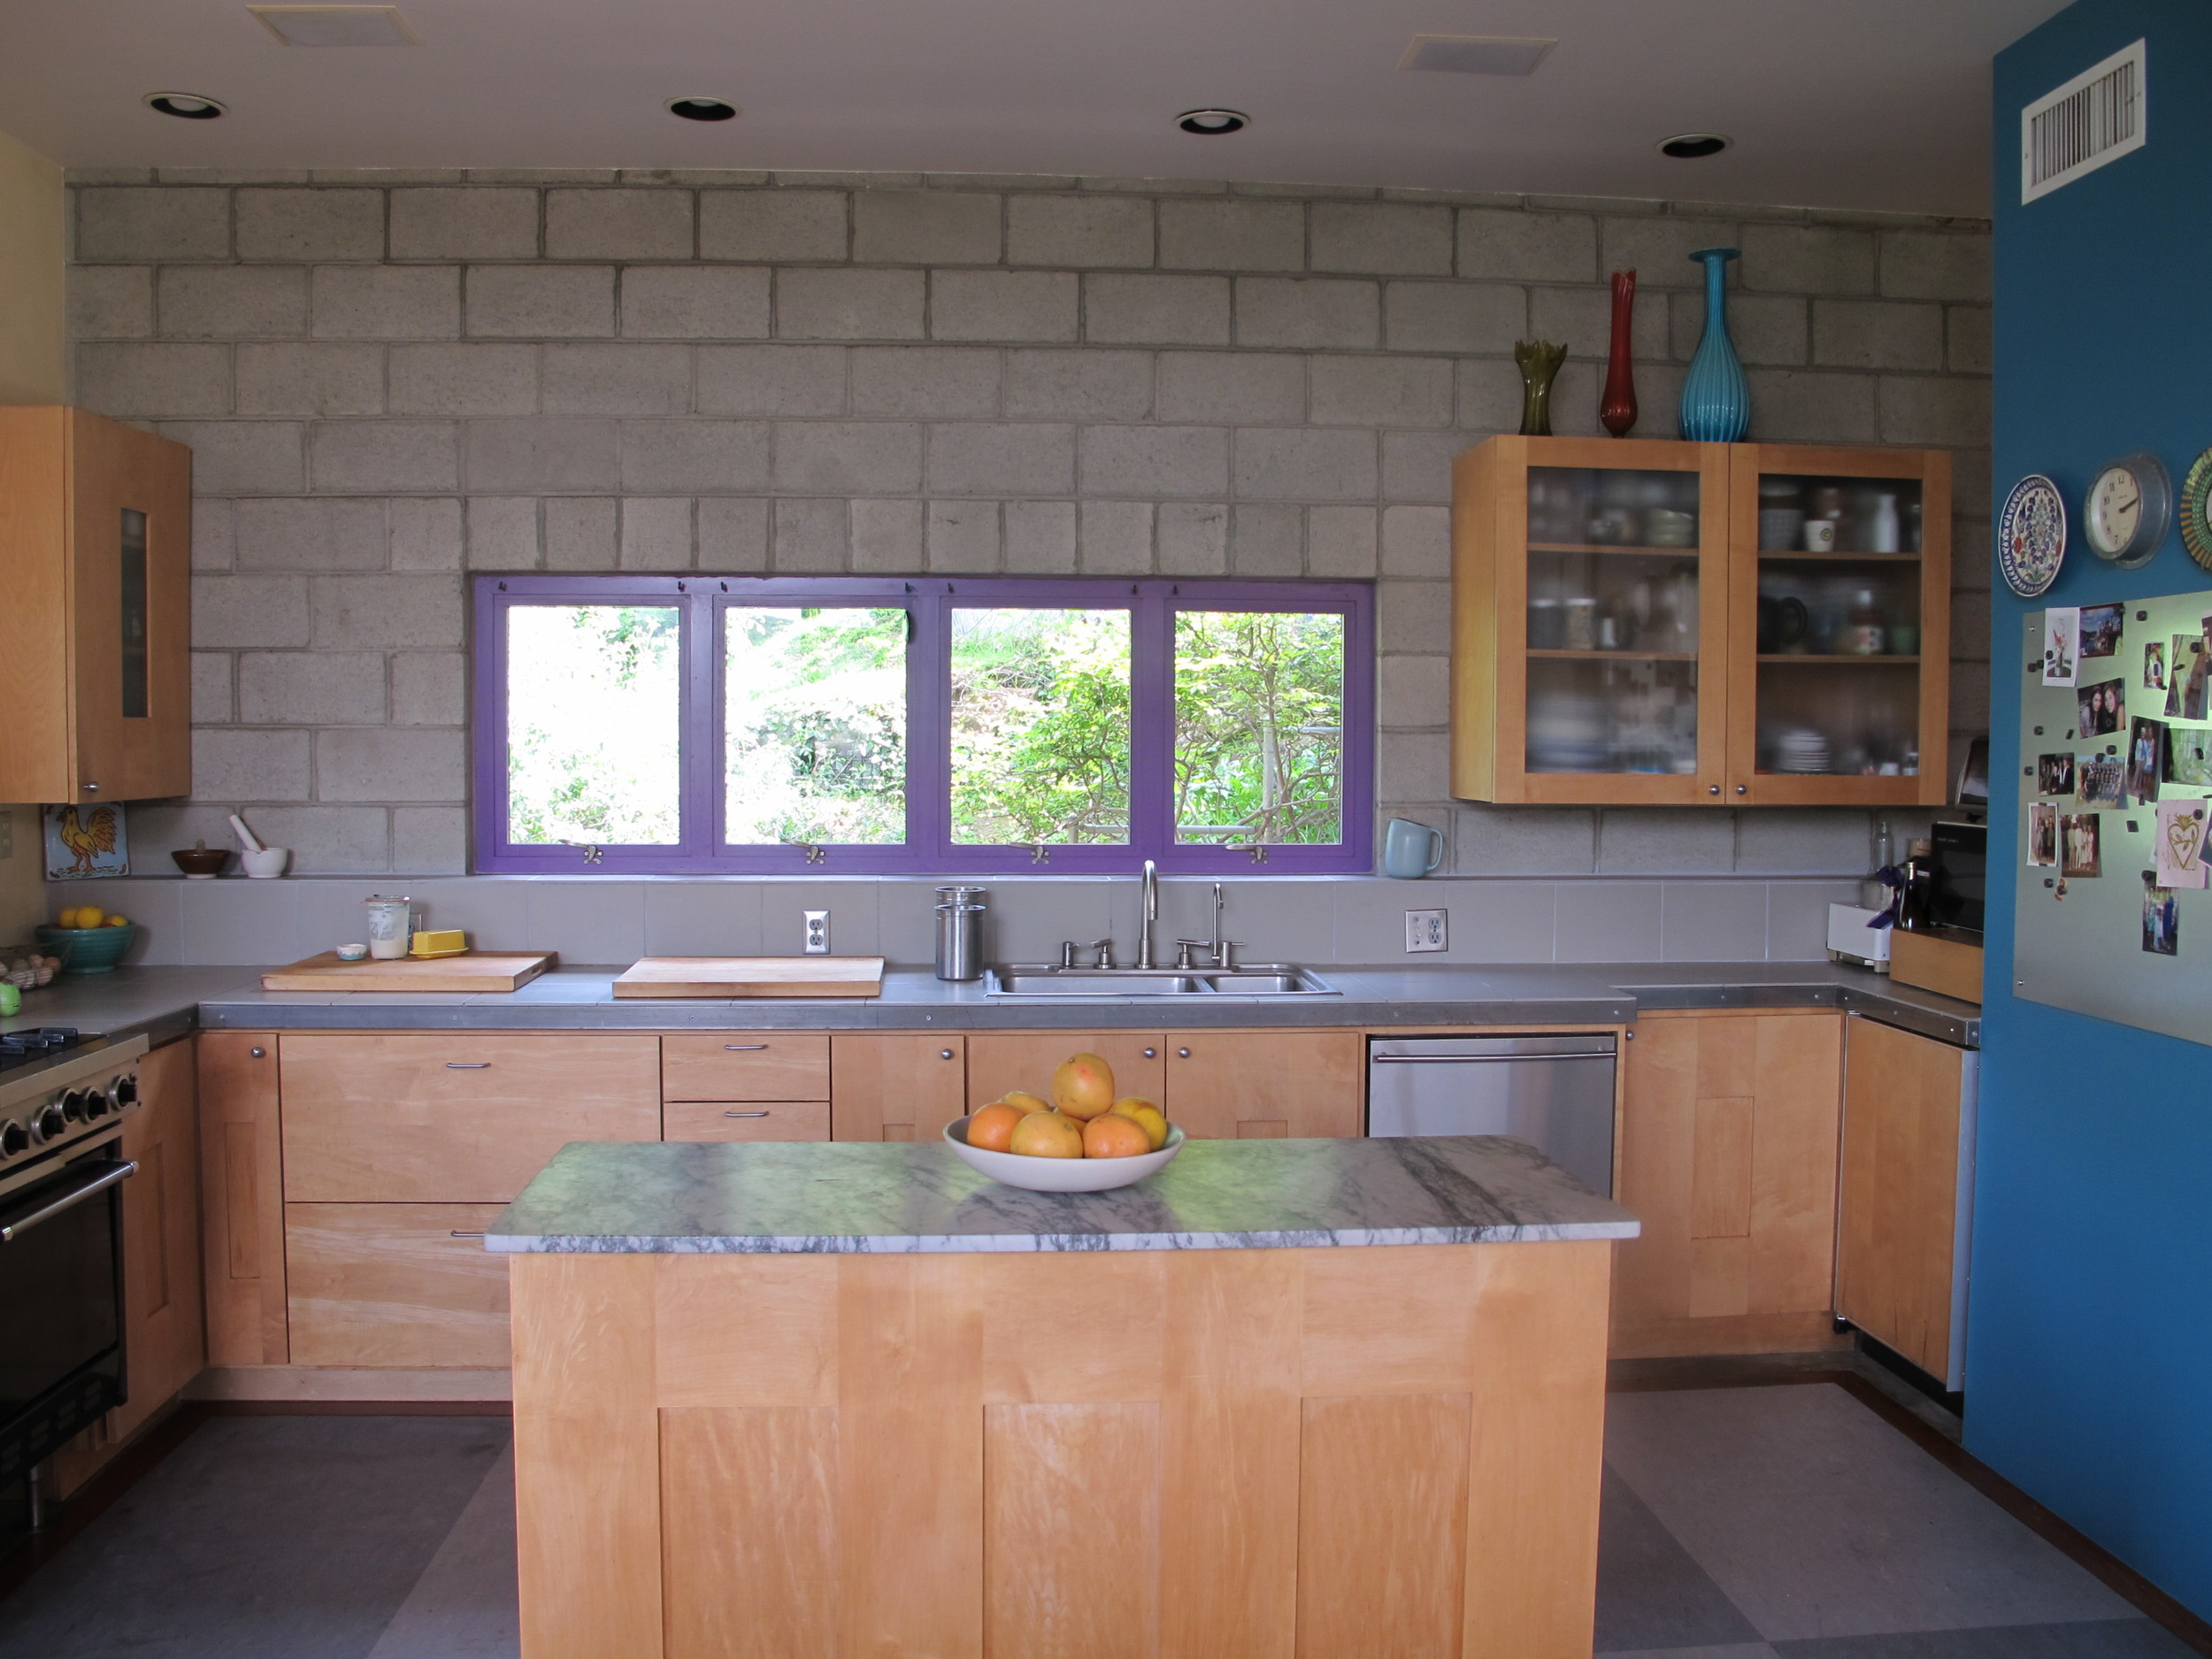 my kitchen in calmer, cleaner times.